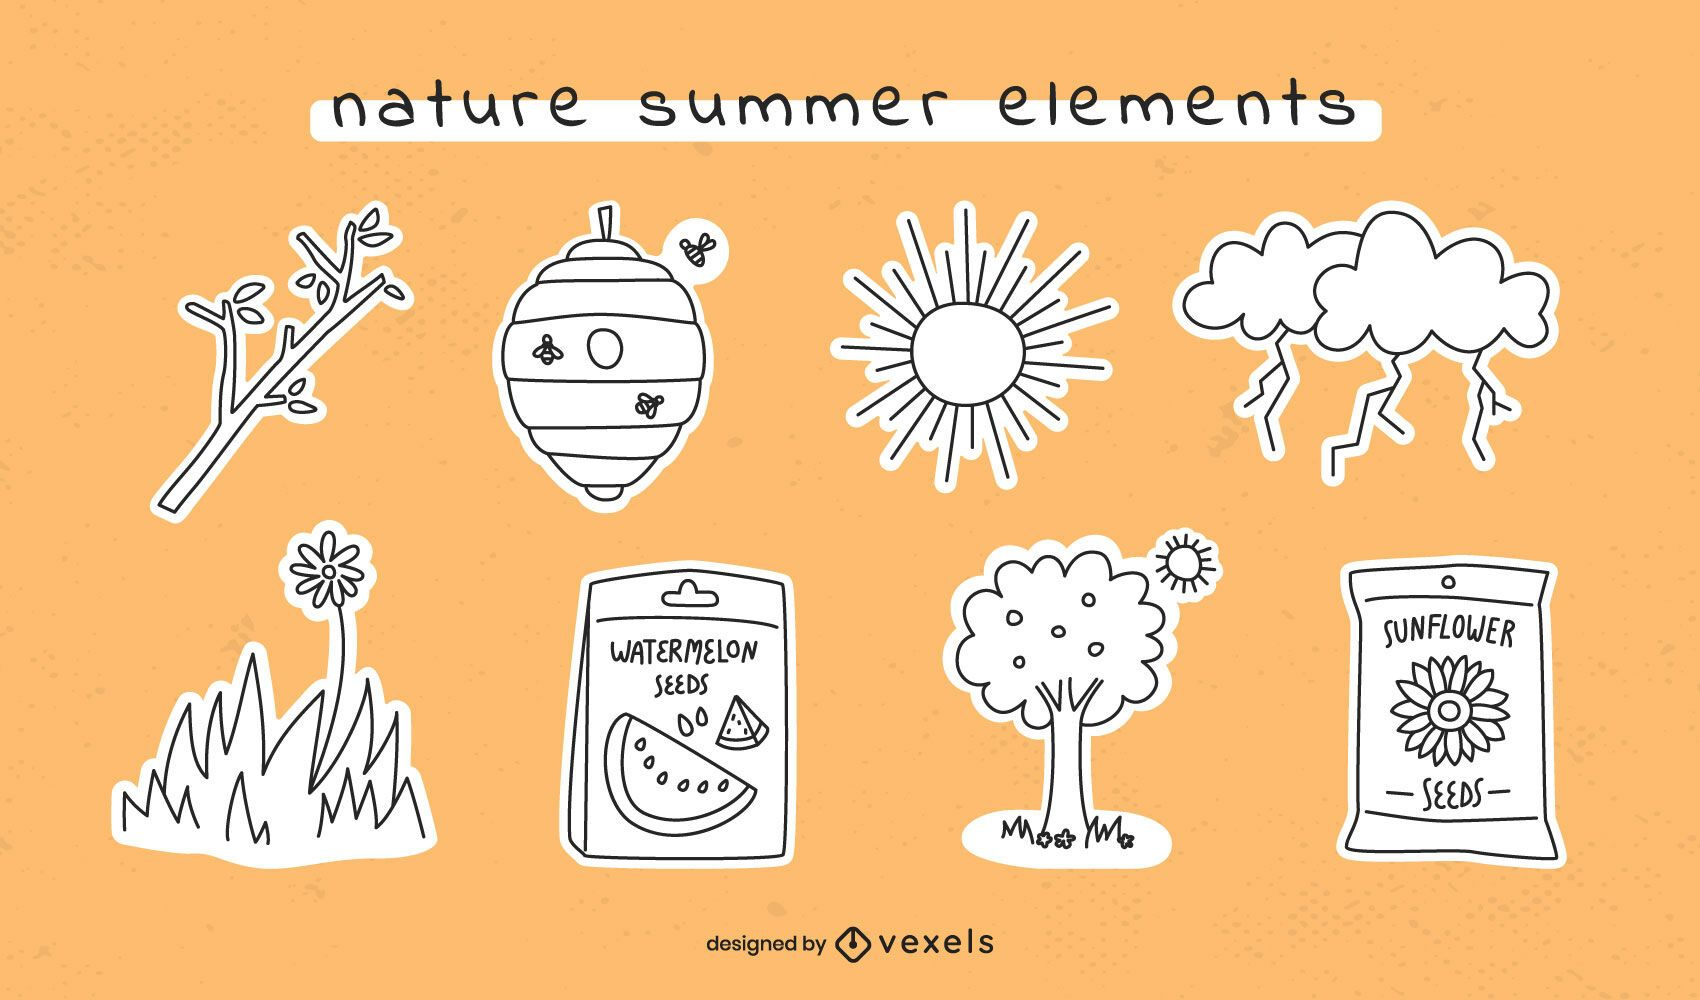 Summer elements stroke